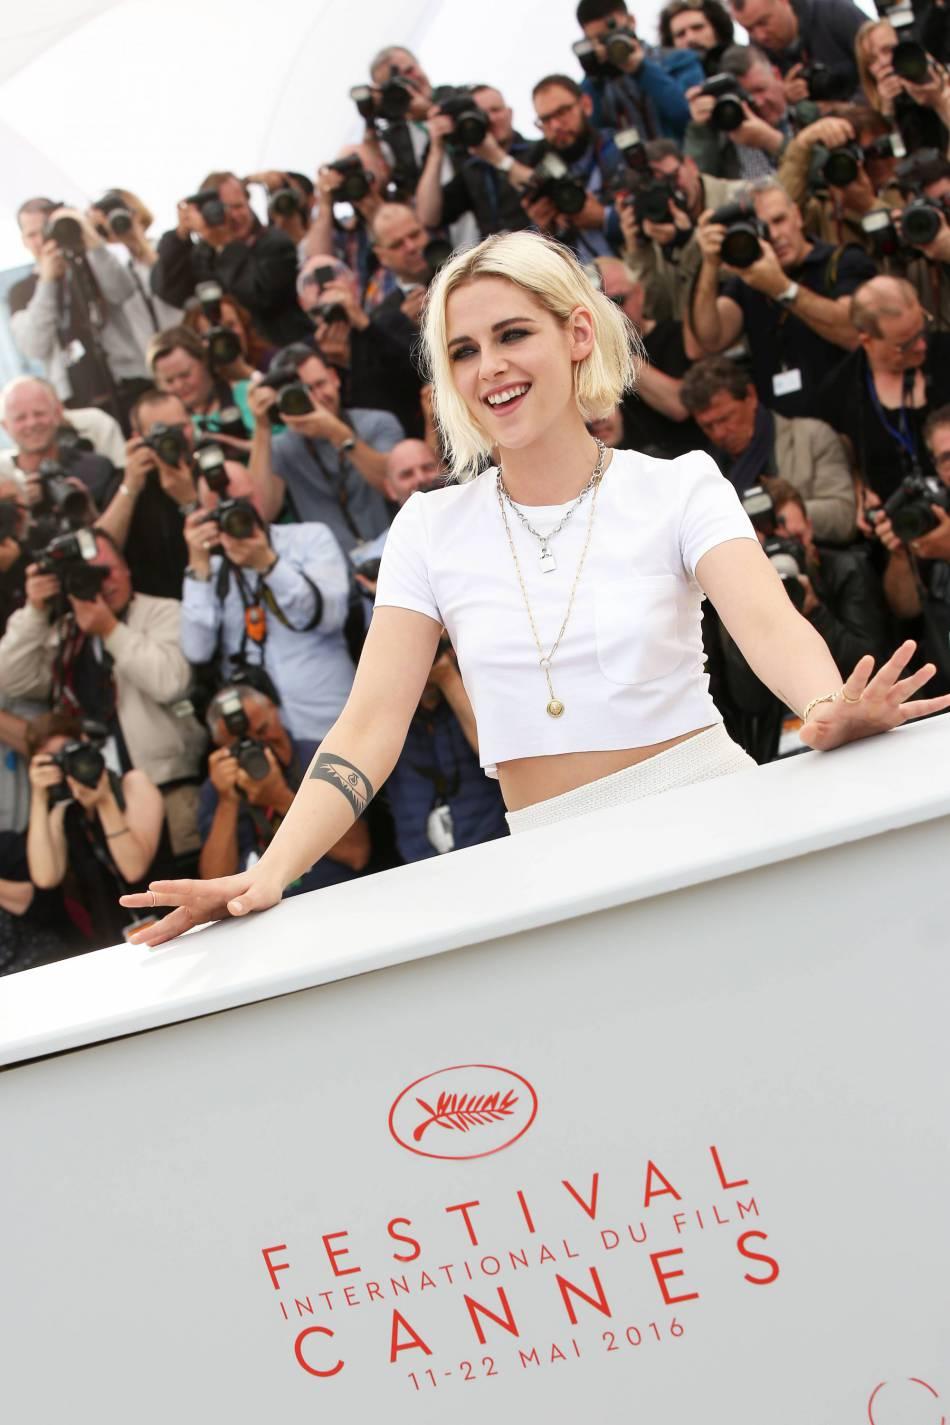 Kristen Stewart, un brin punkette pour Cannes 2016.